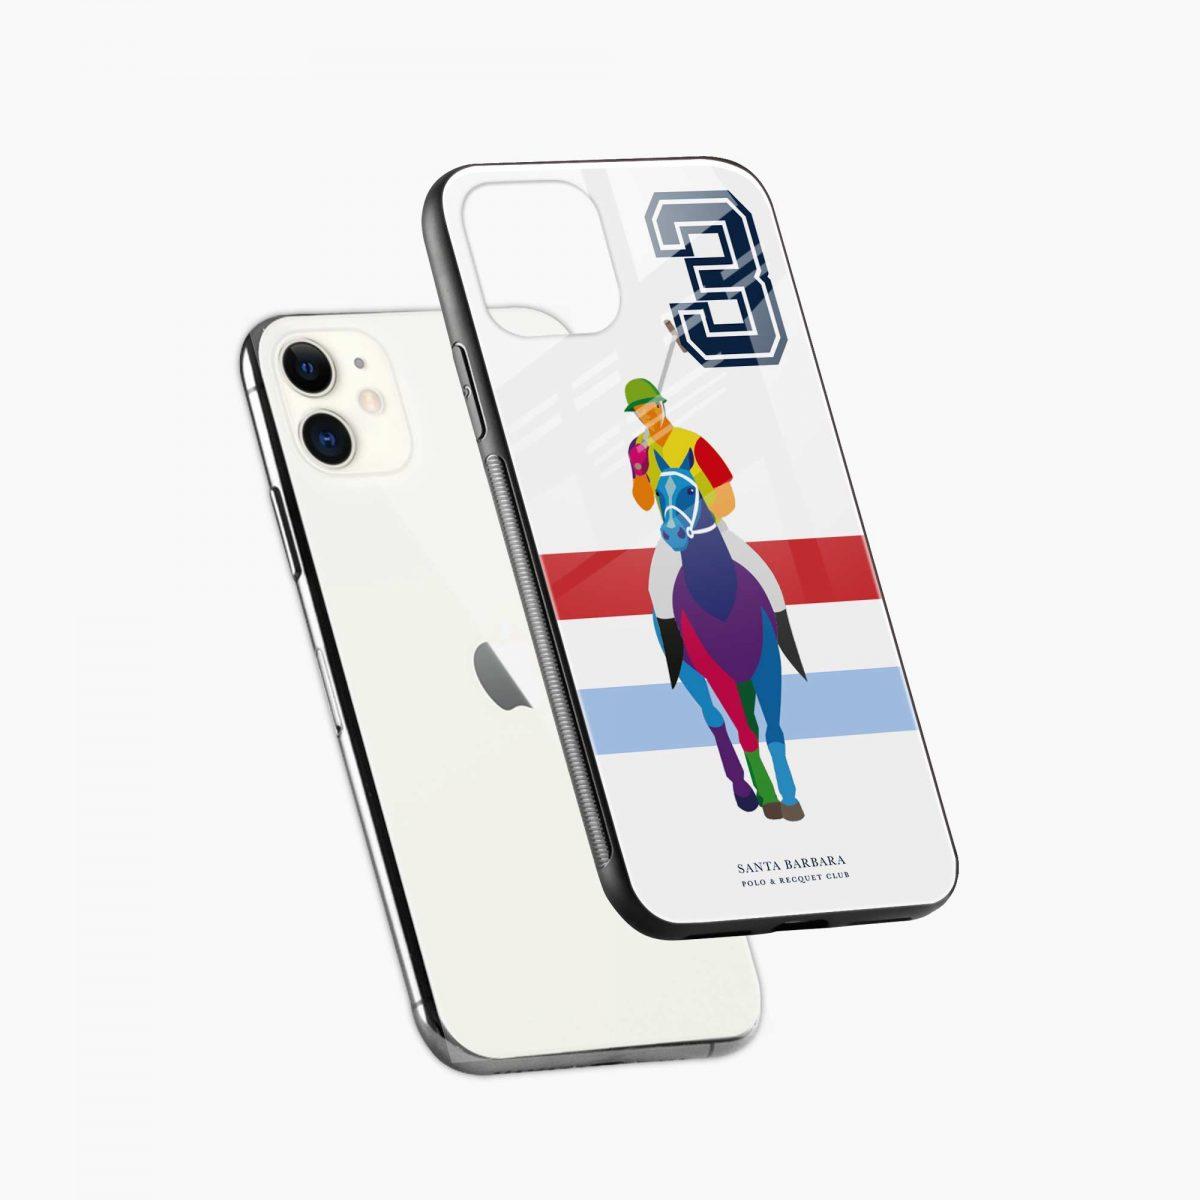 multicolor sant barbara polo iphone back cover diagonal view